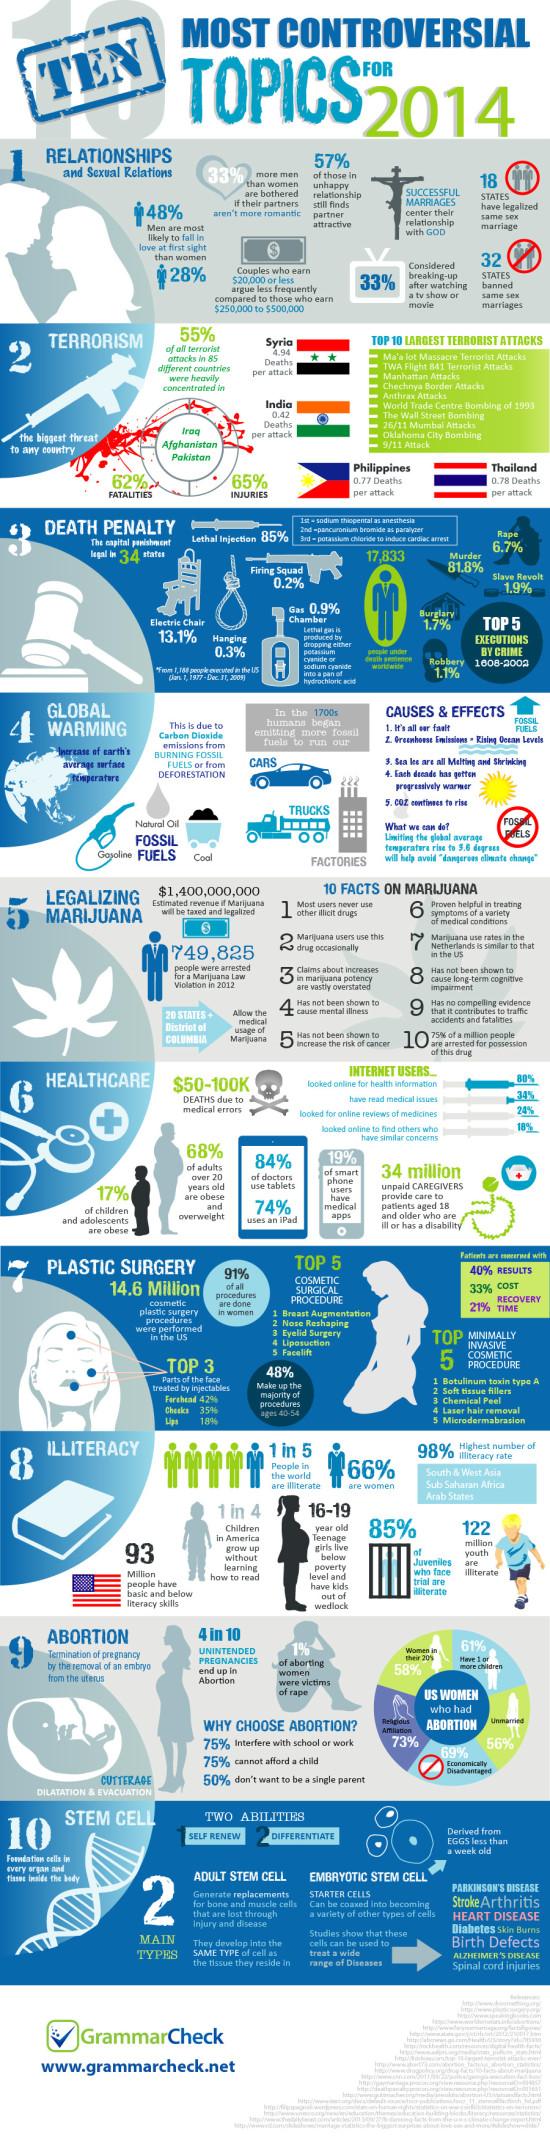 Nejkontroverznejsi temata pro rok 2014 - infografika